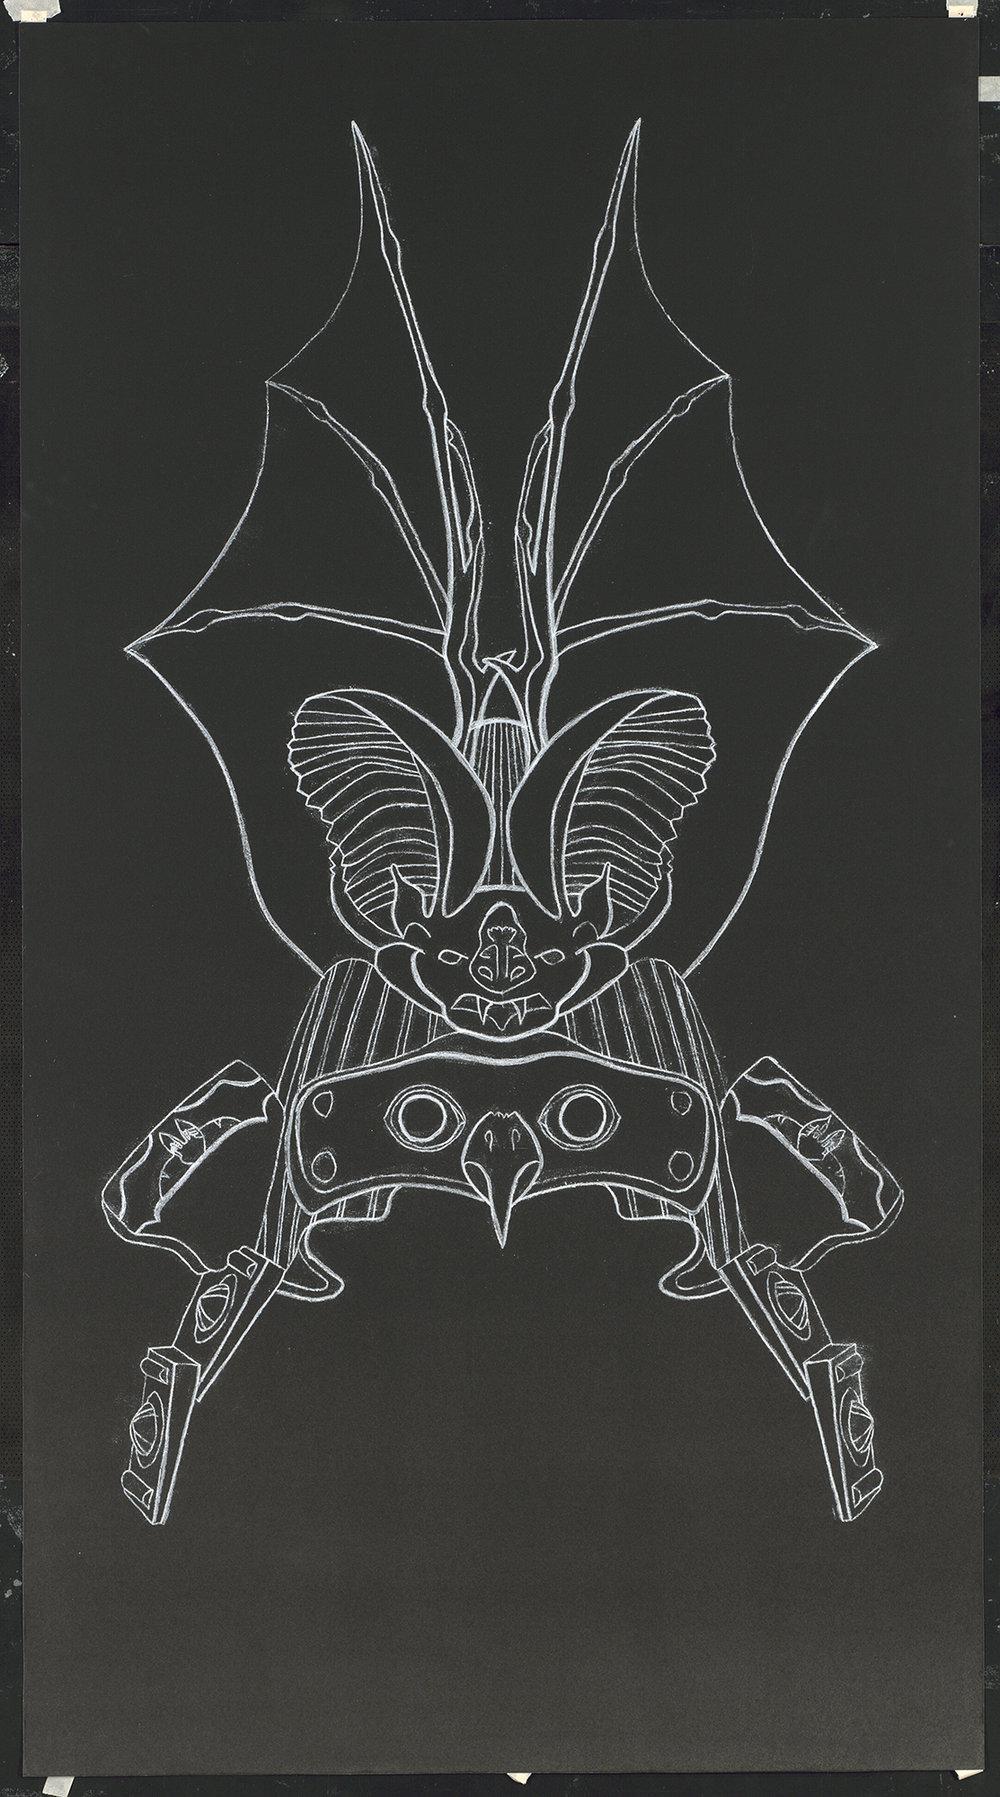 Samurai Helmet #16, 1990